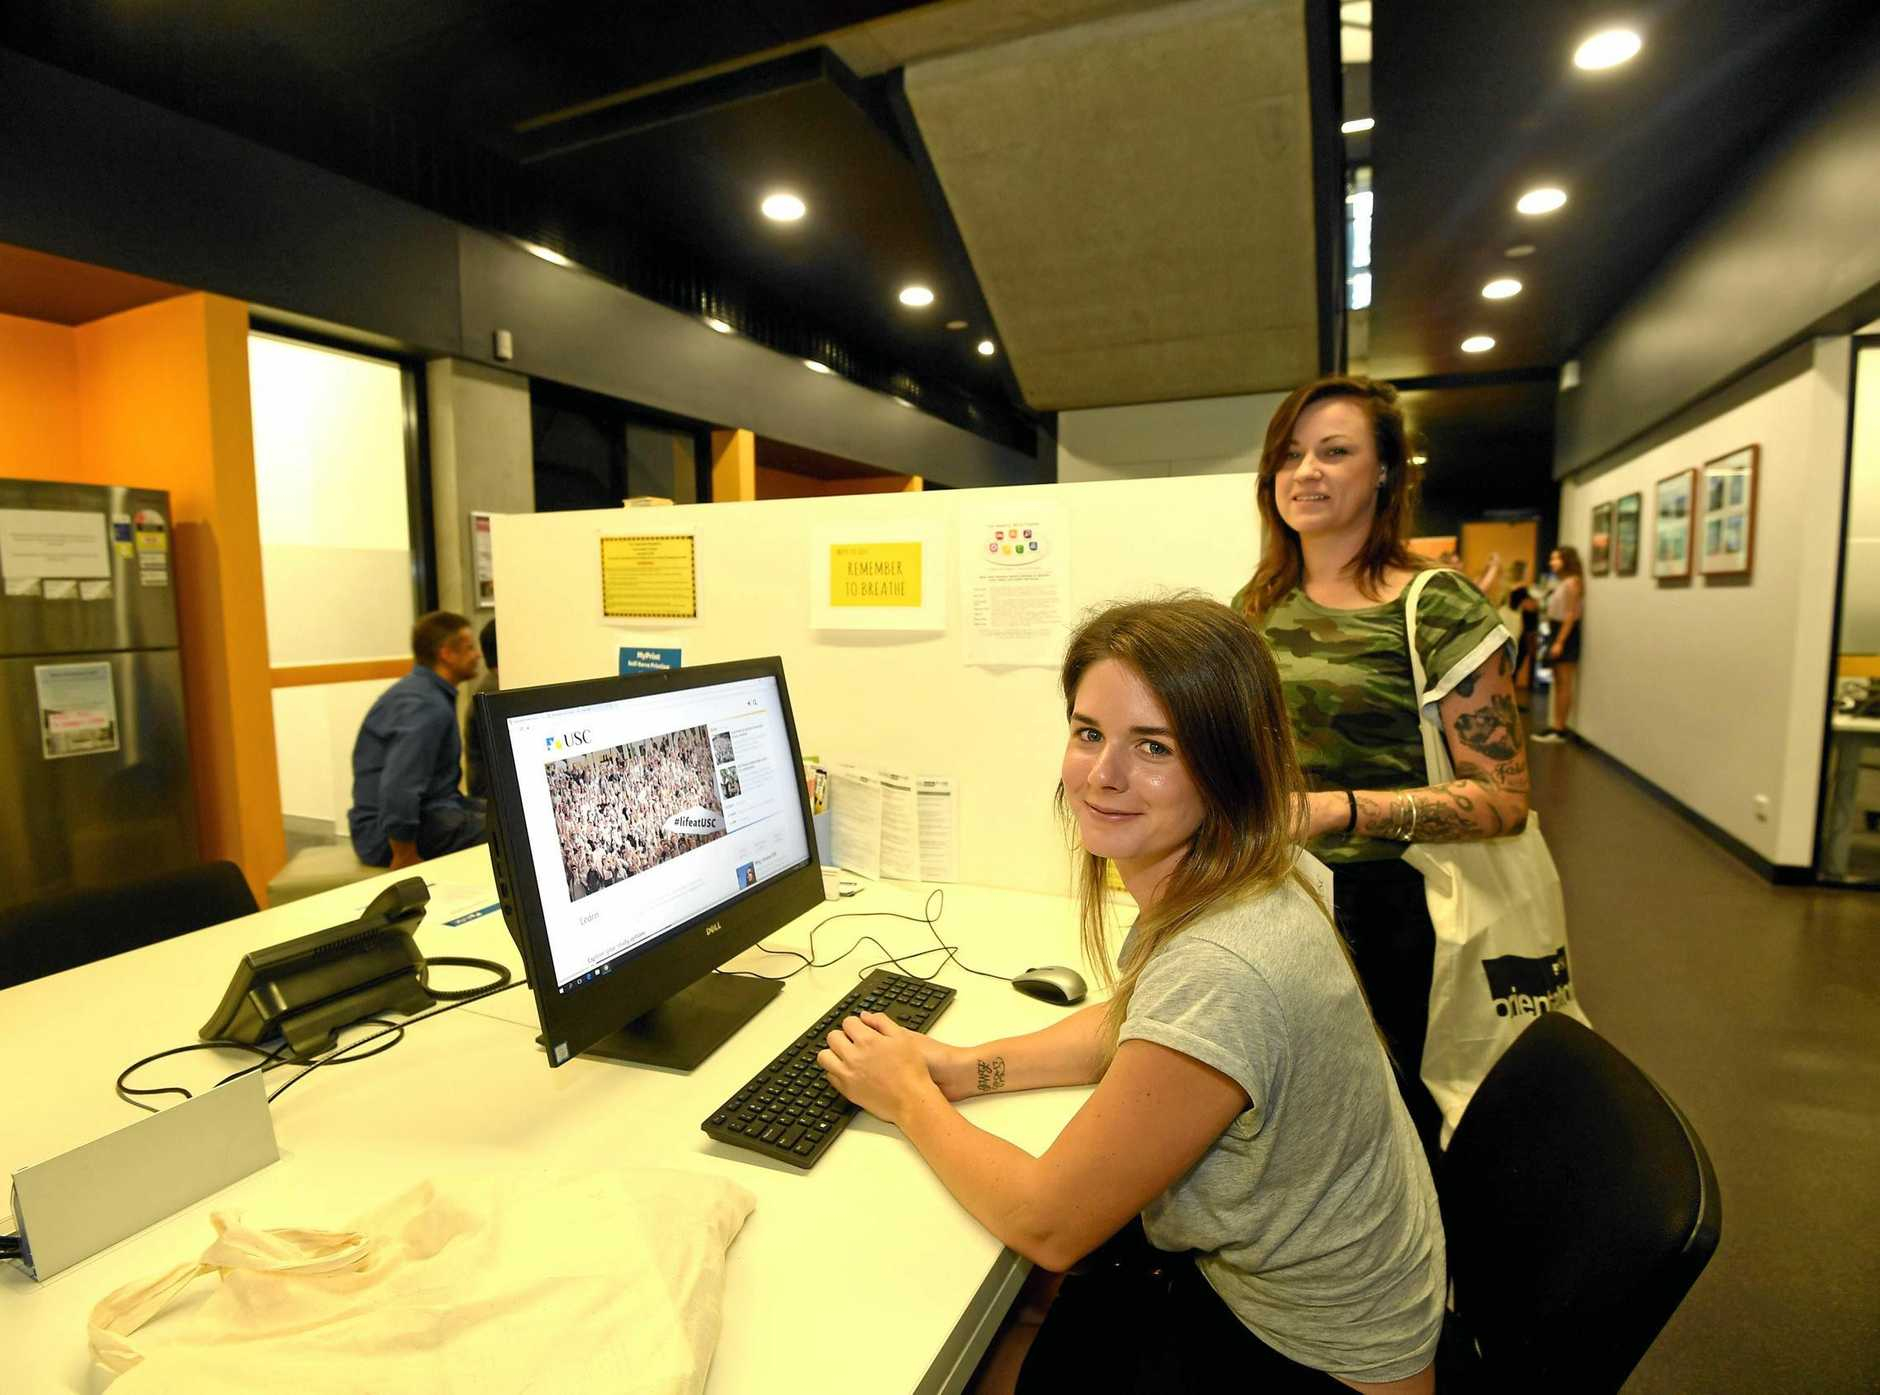 BUZZING: USC students Lateesha Ottesen and Jessica McFarlane at the Gympie Orientation program.